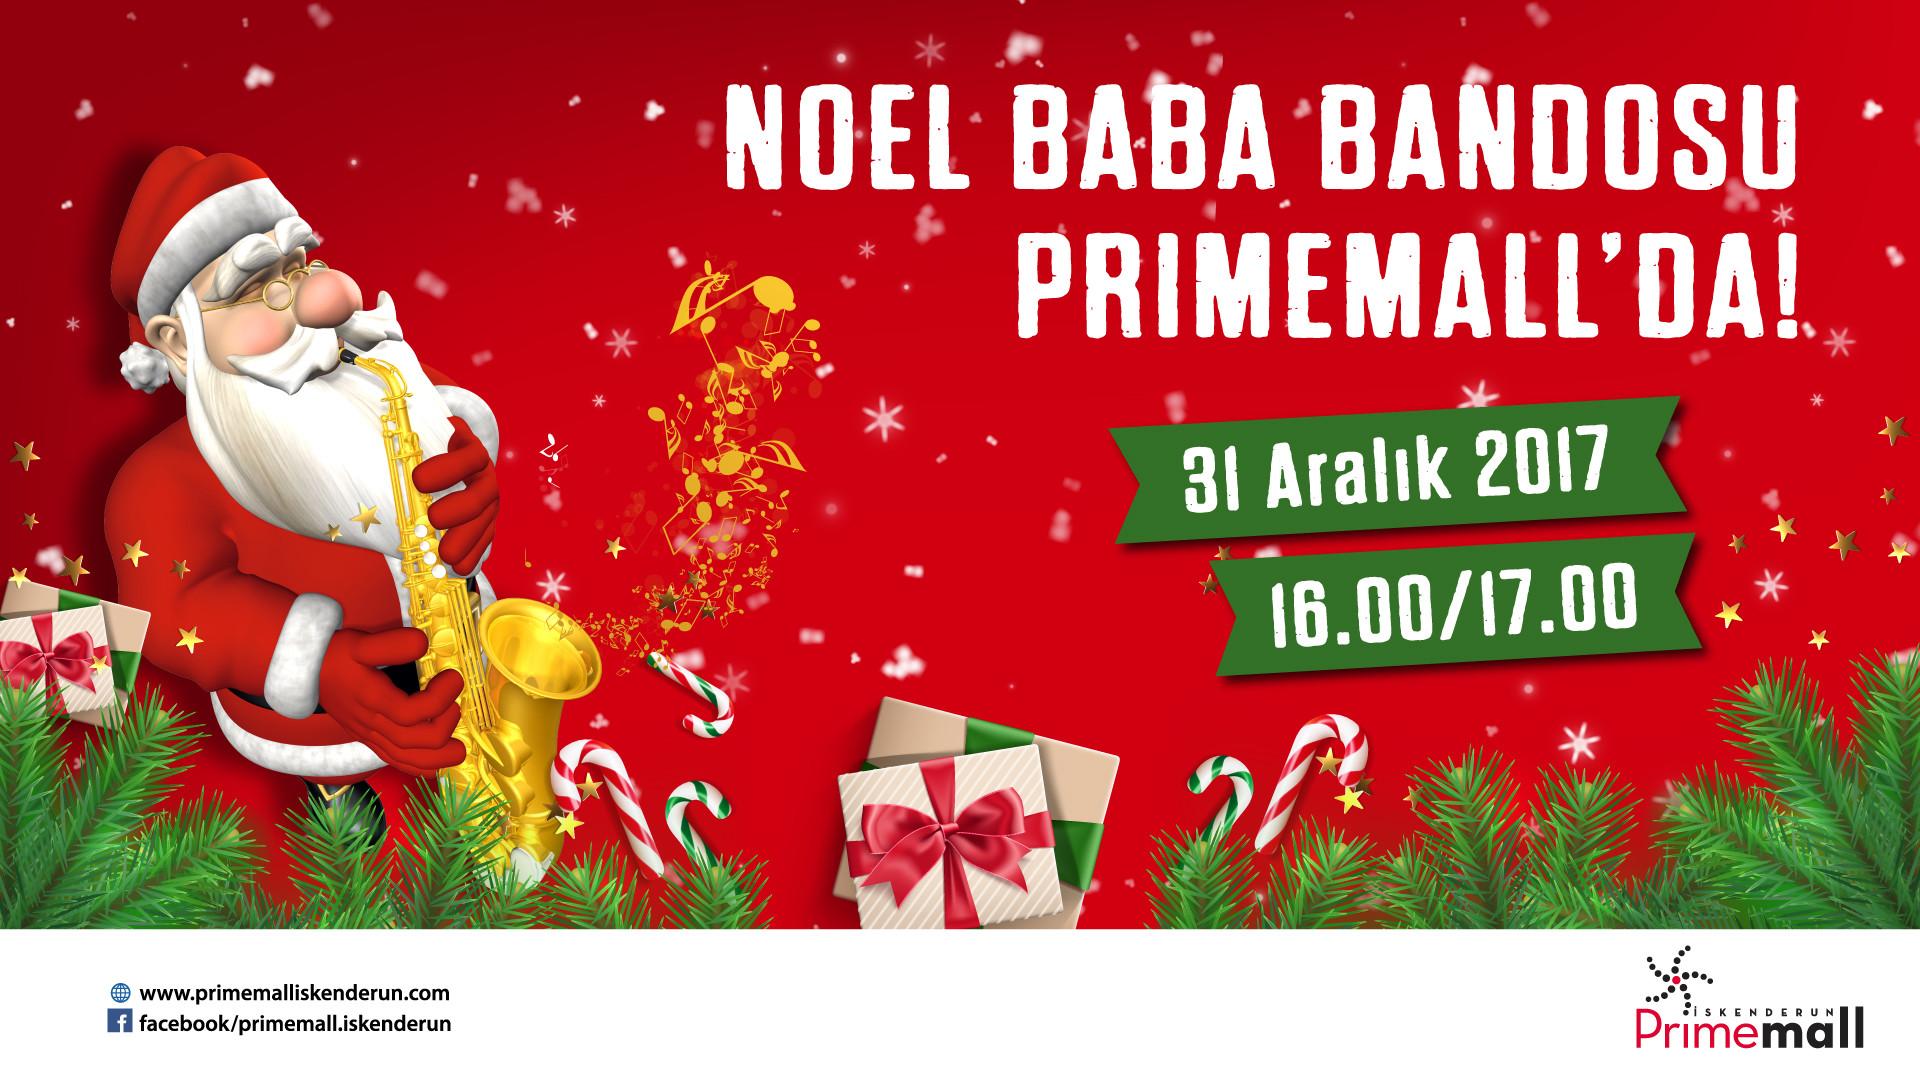 Noel Baba Bandosu Primemall'da